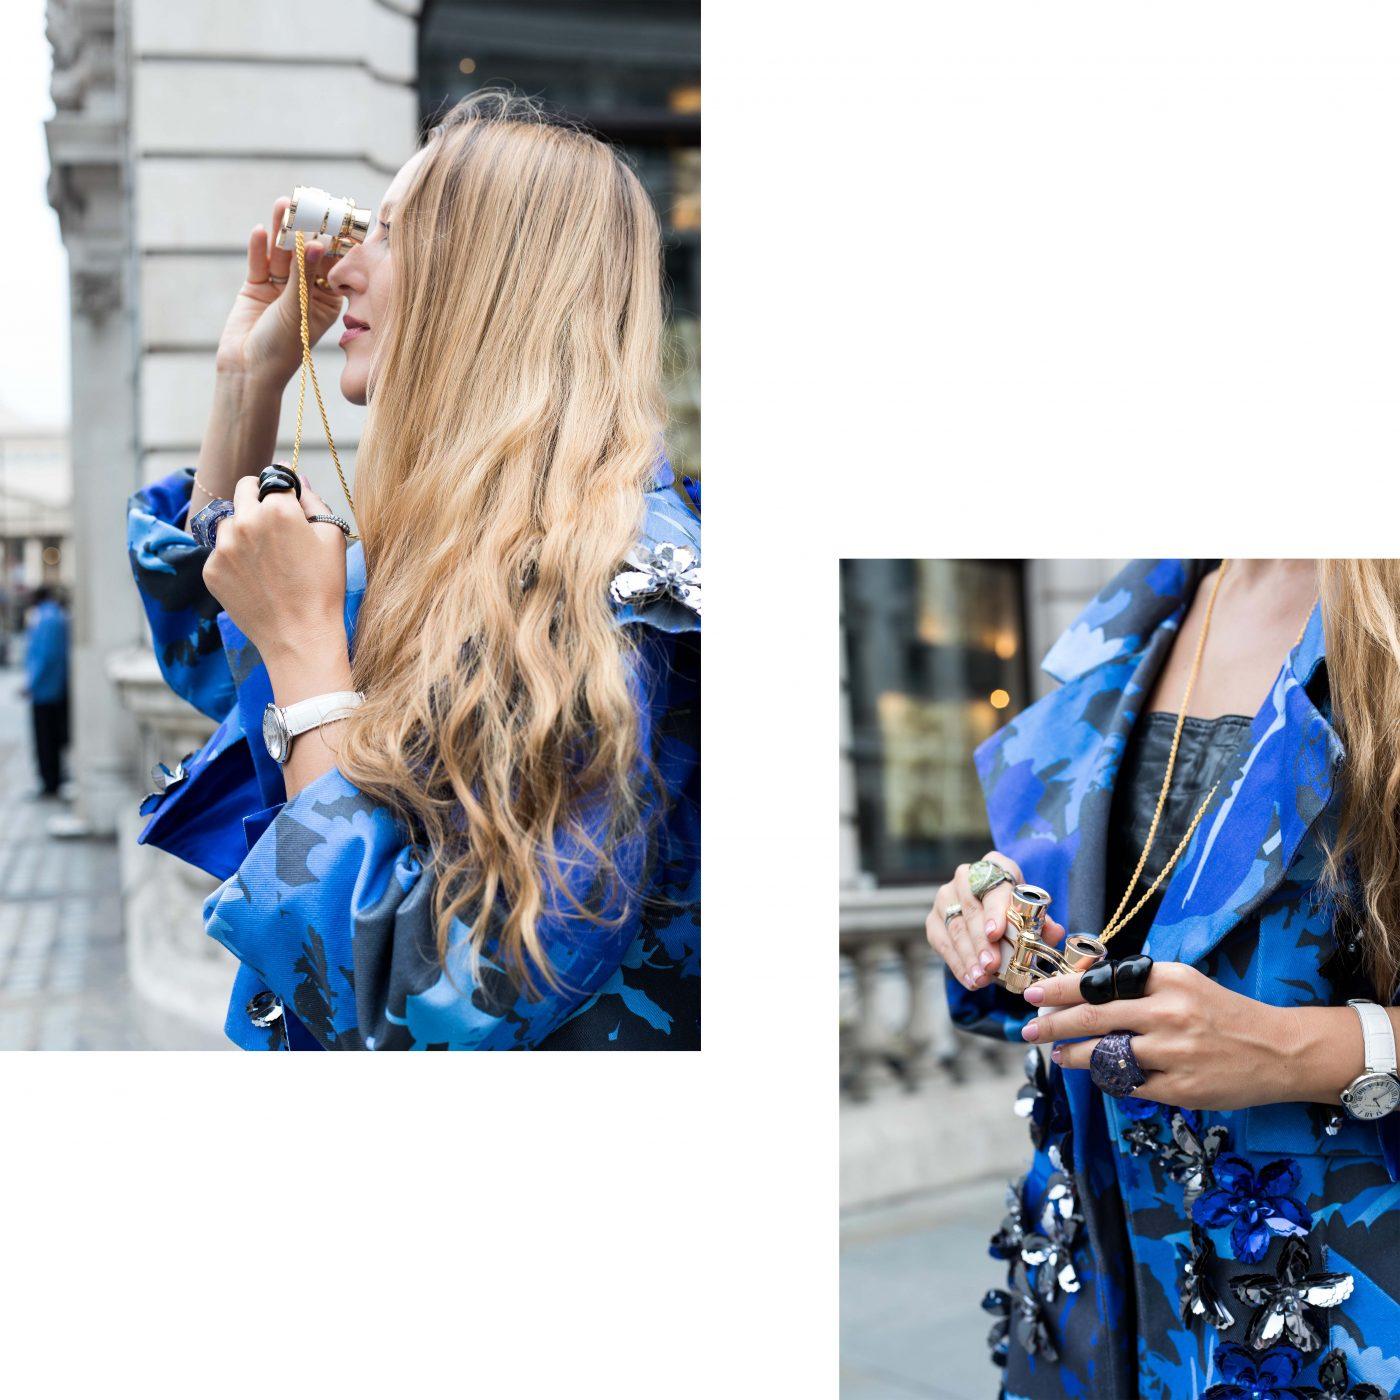 GEMOLOGUELiza Urla_jewellery blogger Liza_jewelry blogger Liza_jewelry blog_jewellery blog UK_jewellery blog London_blog about jewellery_london fashion week jewellery_london fashion week jewellery 2019_london fashion week street style ss20_lfw street style 2019_jewellery events in london_jewellery events london_jewellery bloggers london_jewellery bloggers uk_paul costelloe fashion show_paul costelloe ss20